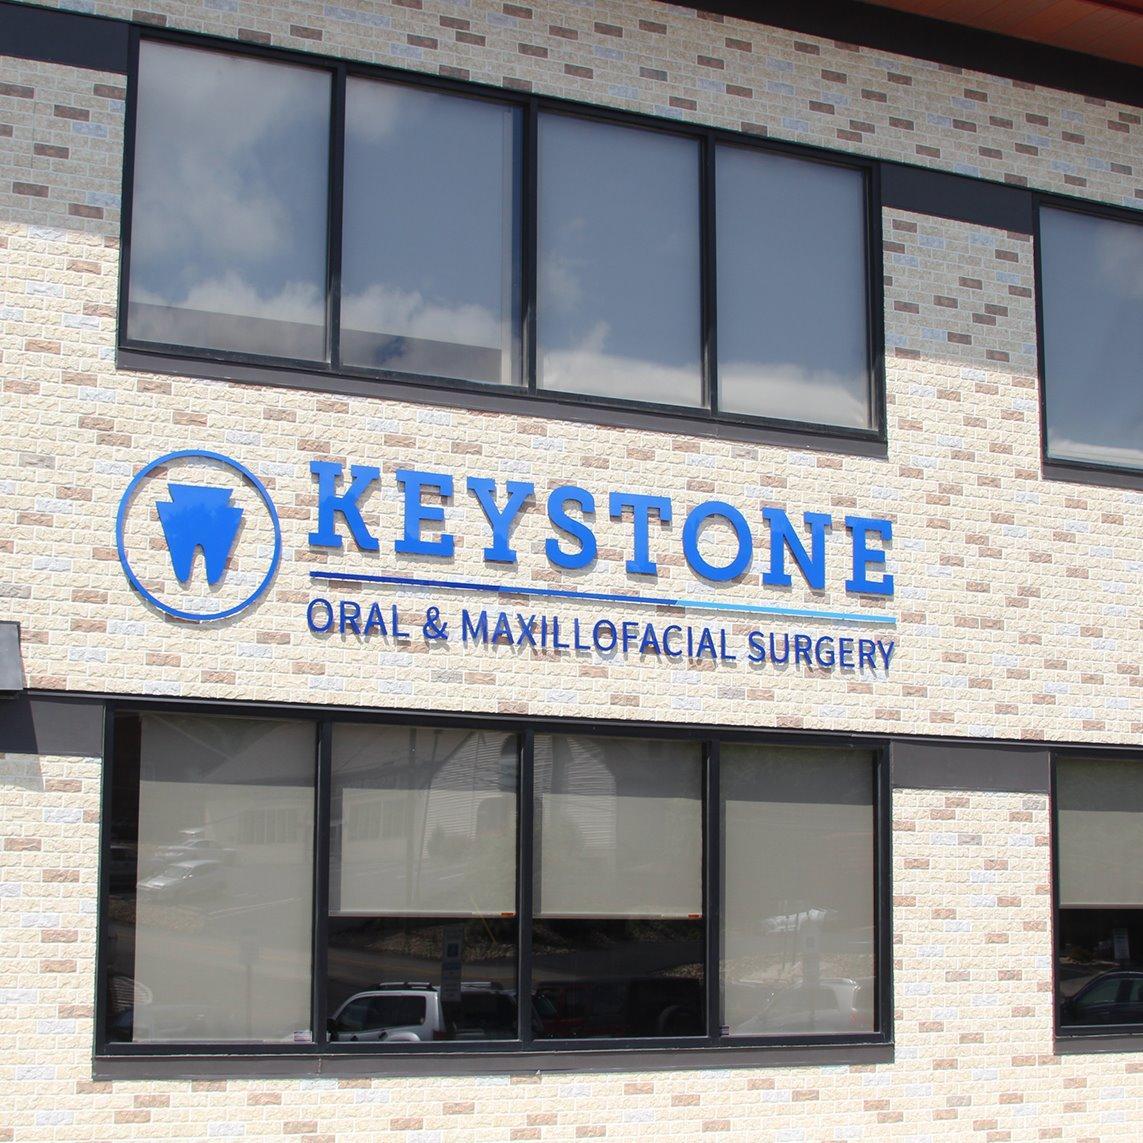 Keystone Oral And Maxillofacial Surgery